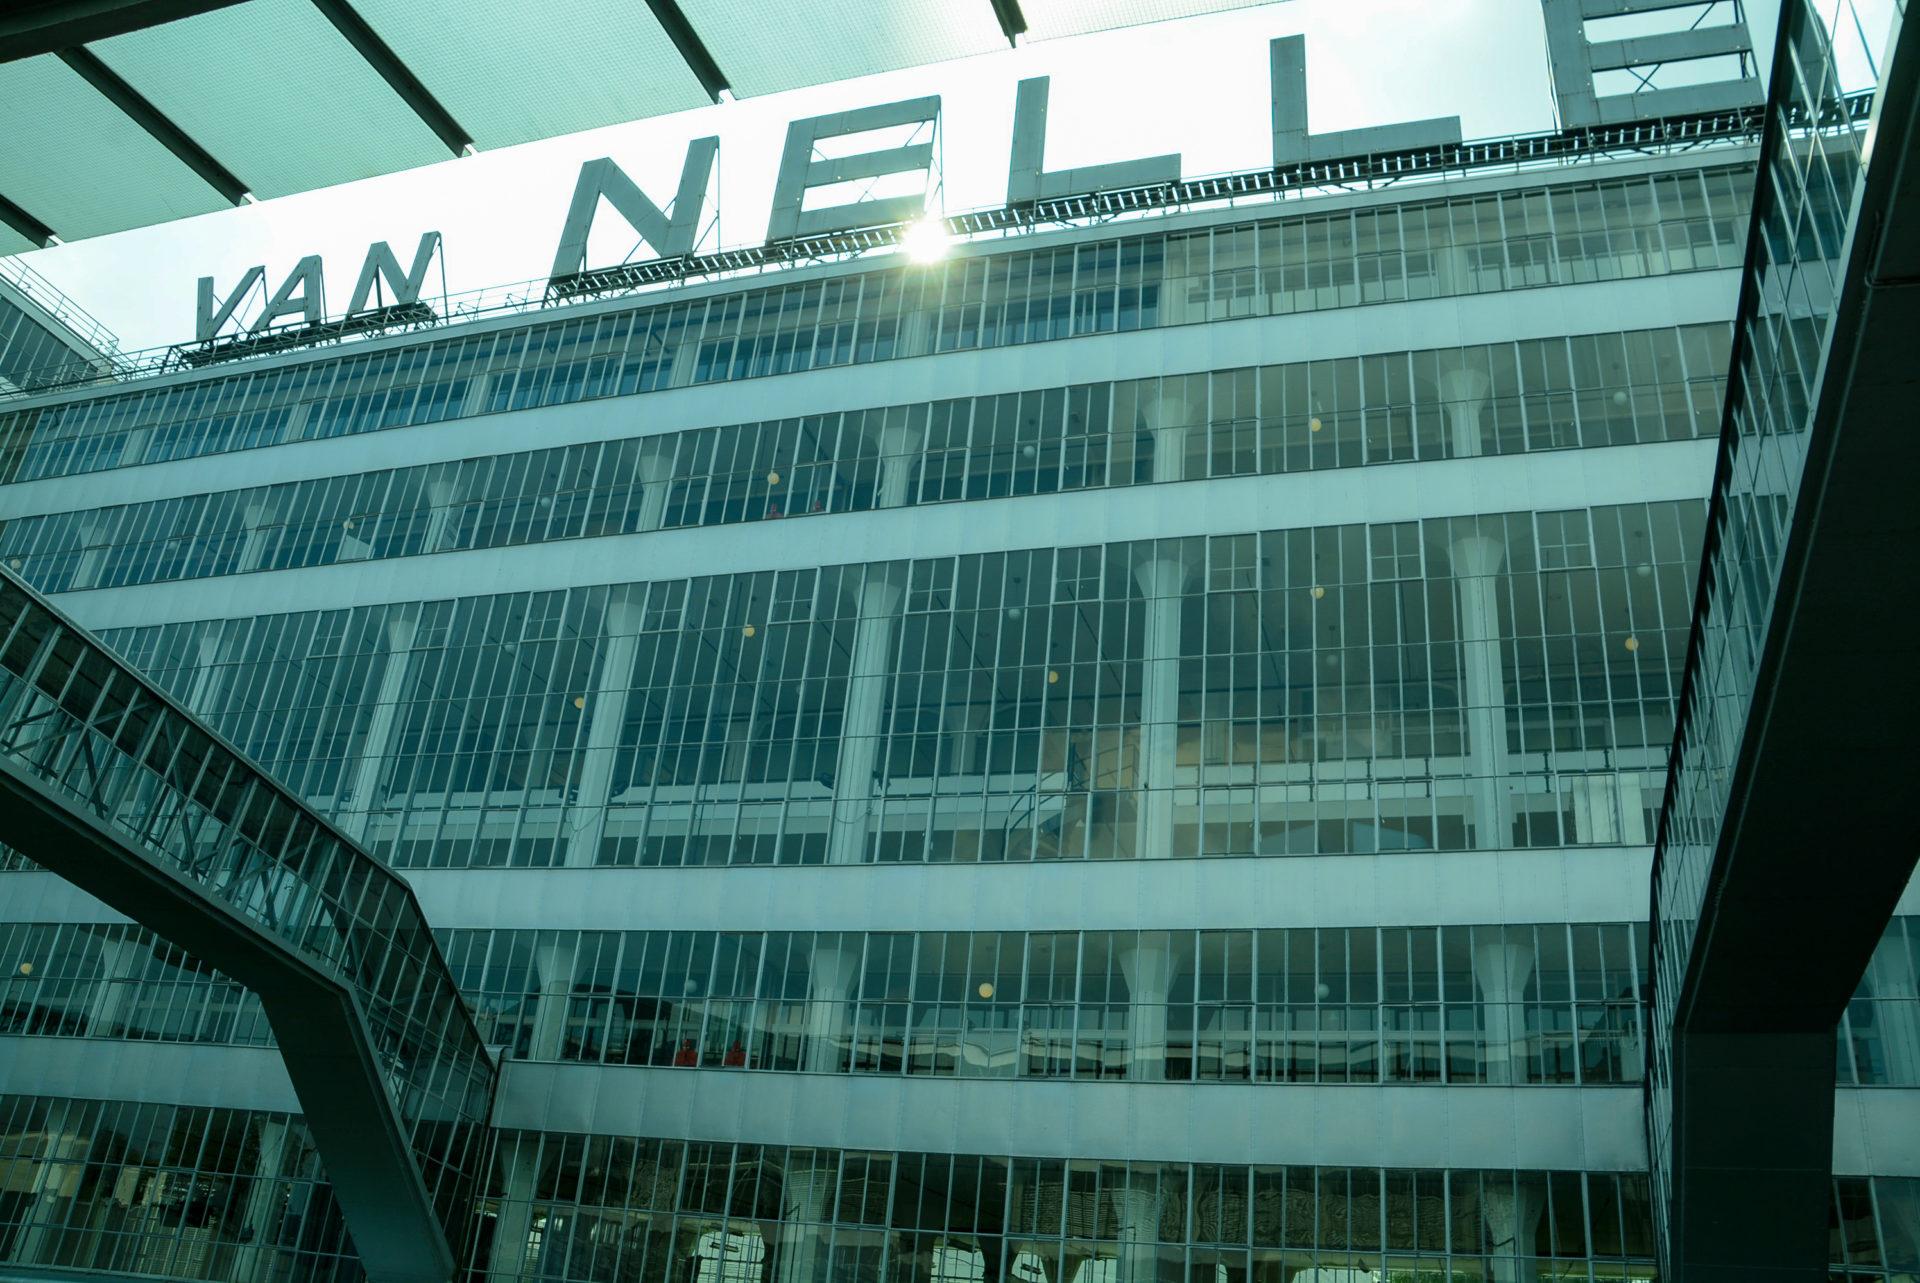 Die Van Nelle Fabrik in Rotterdam ist Weltkulturerbe der Unesco